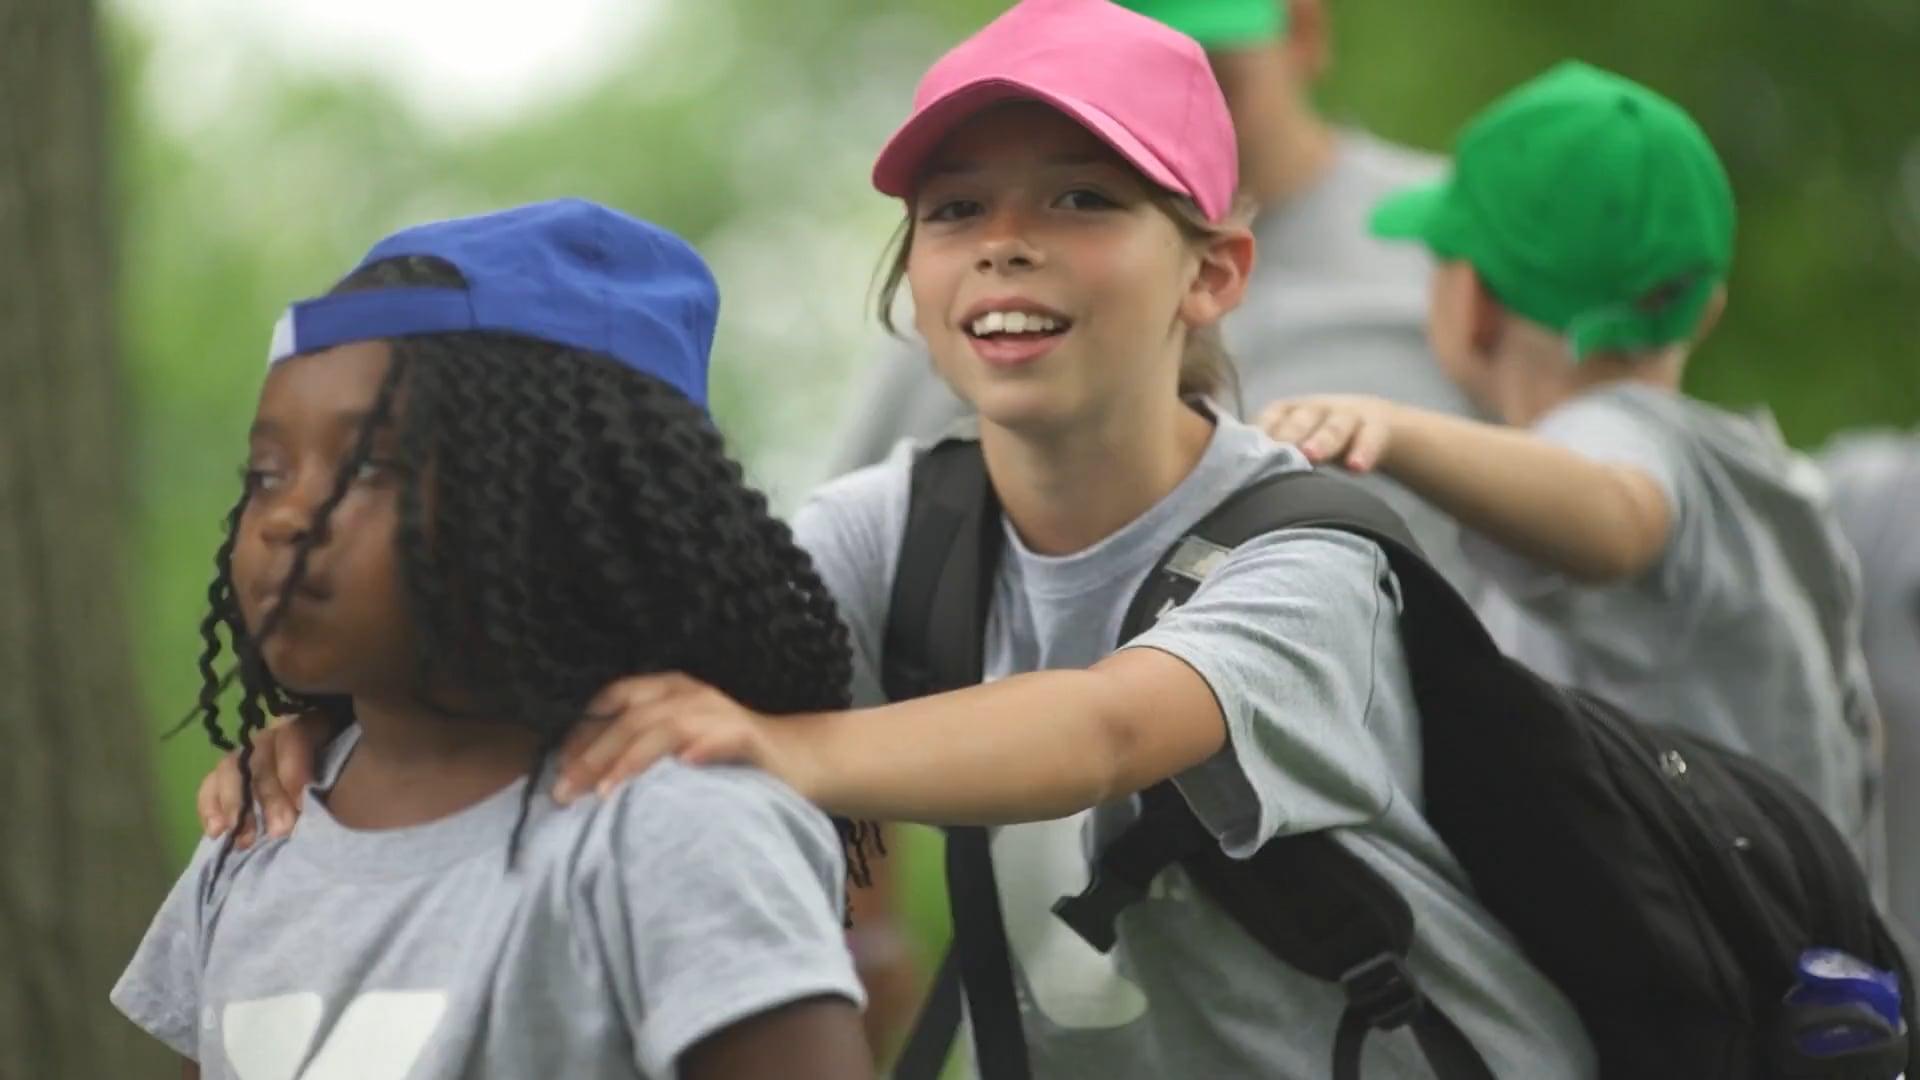 YMCA Summer Camp